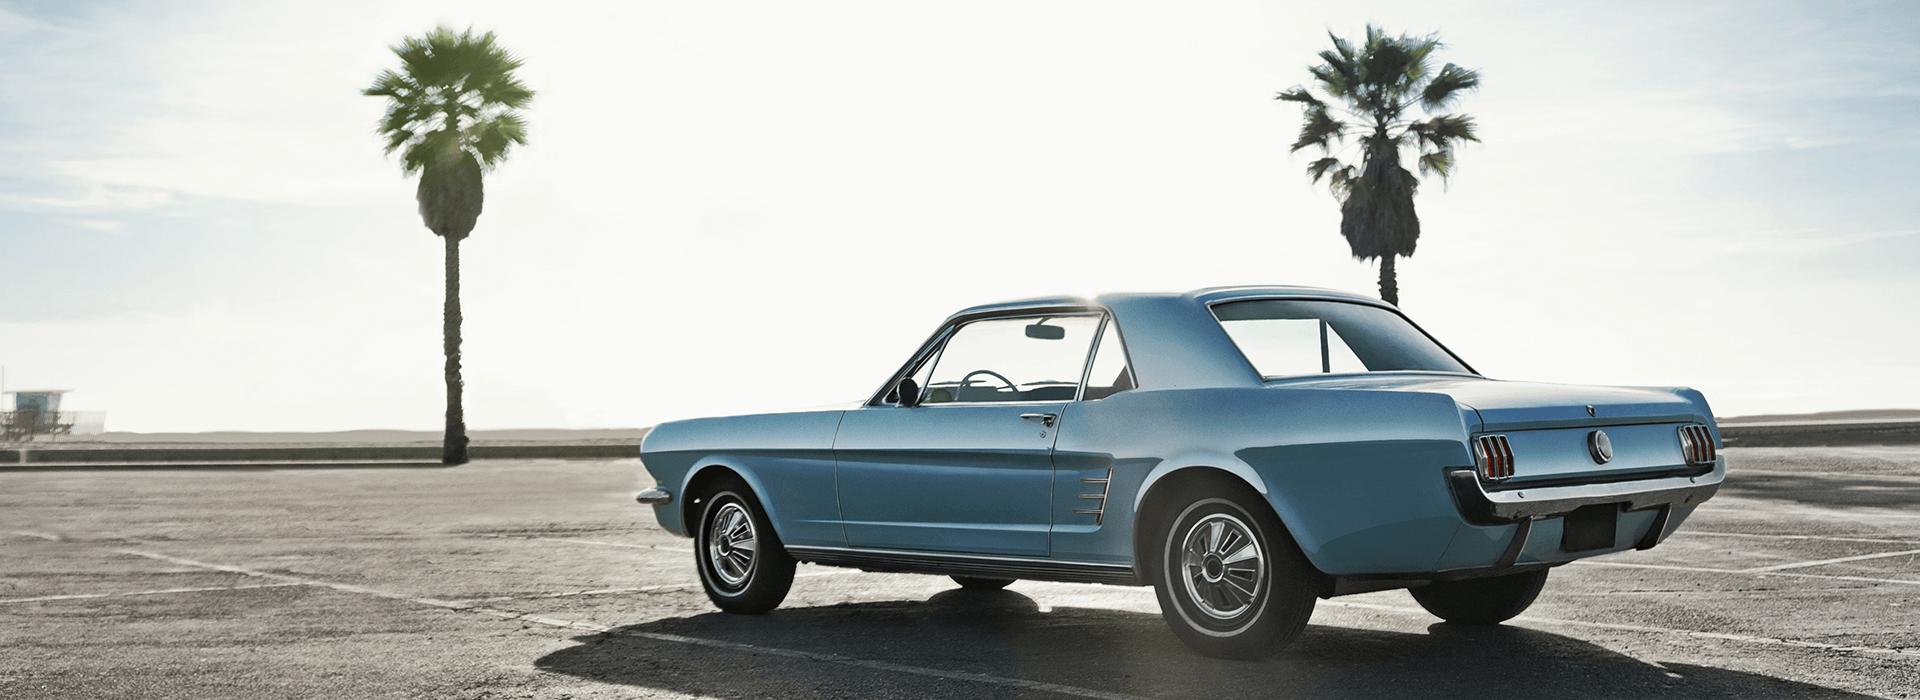 auto09-americancars-hoeilaart